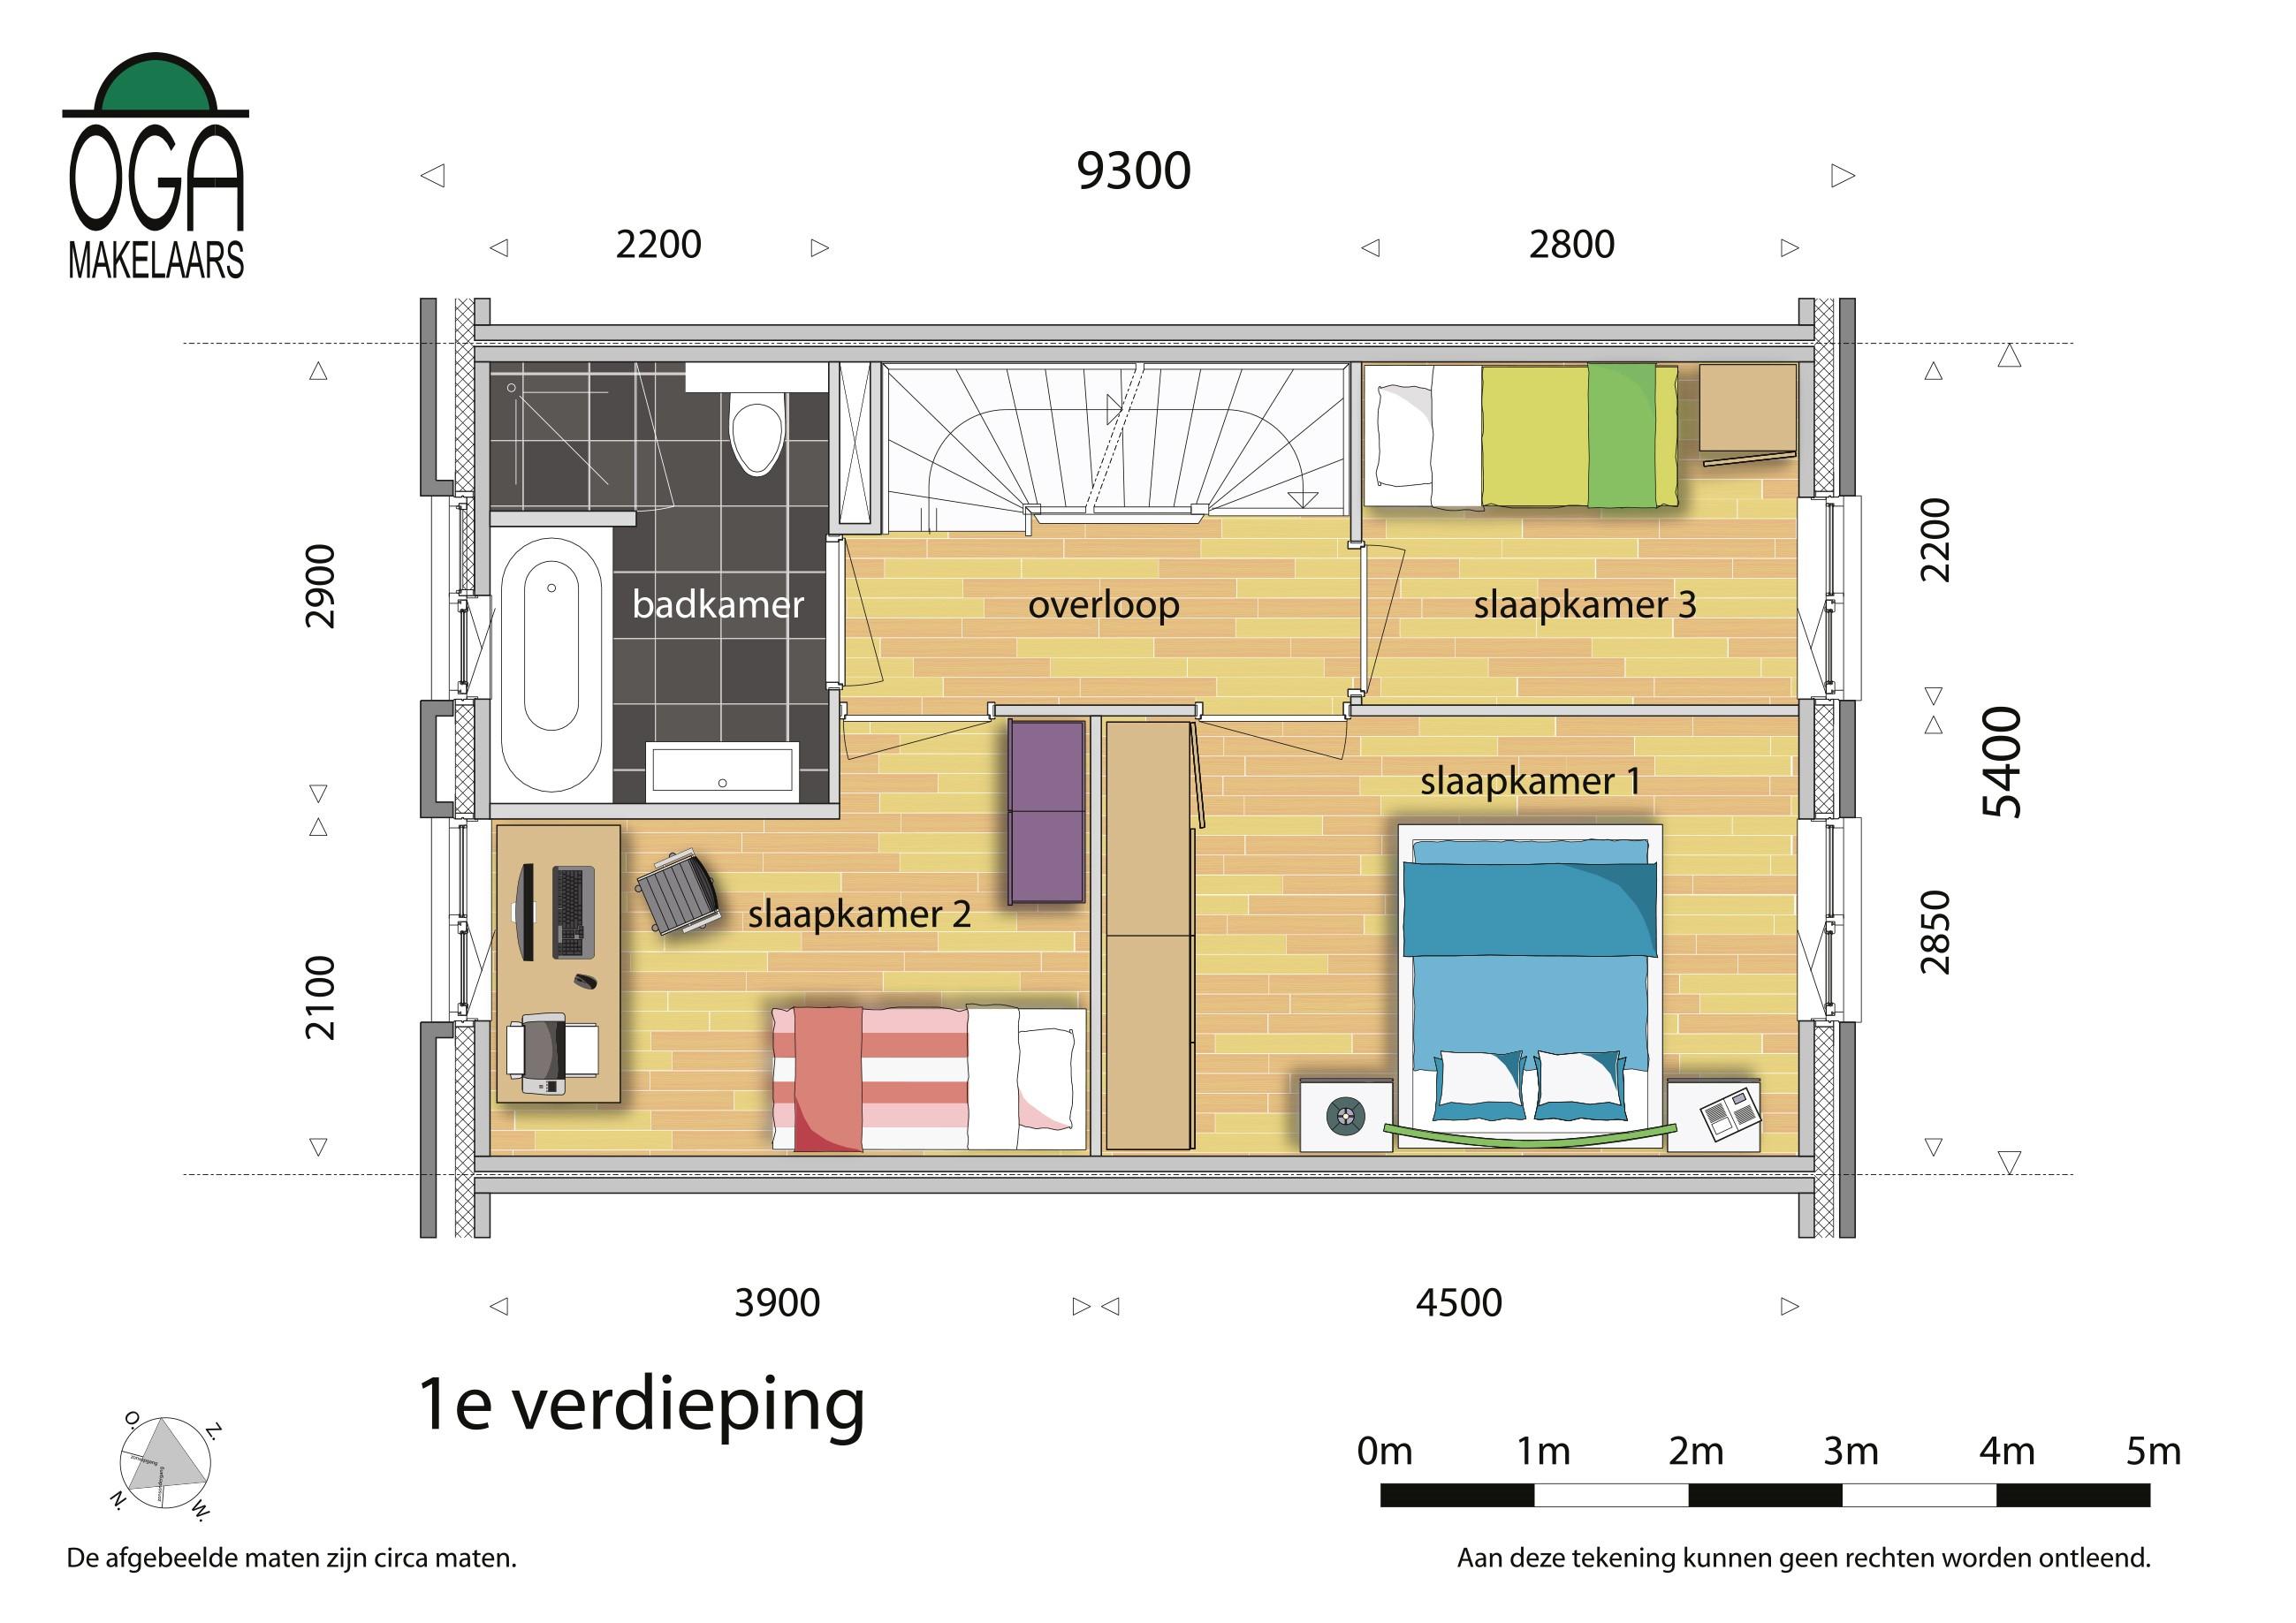 Hoek van Holland, <span>Leen van Ooijenlaan  34